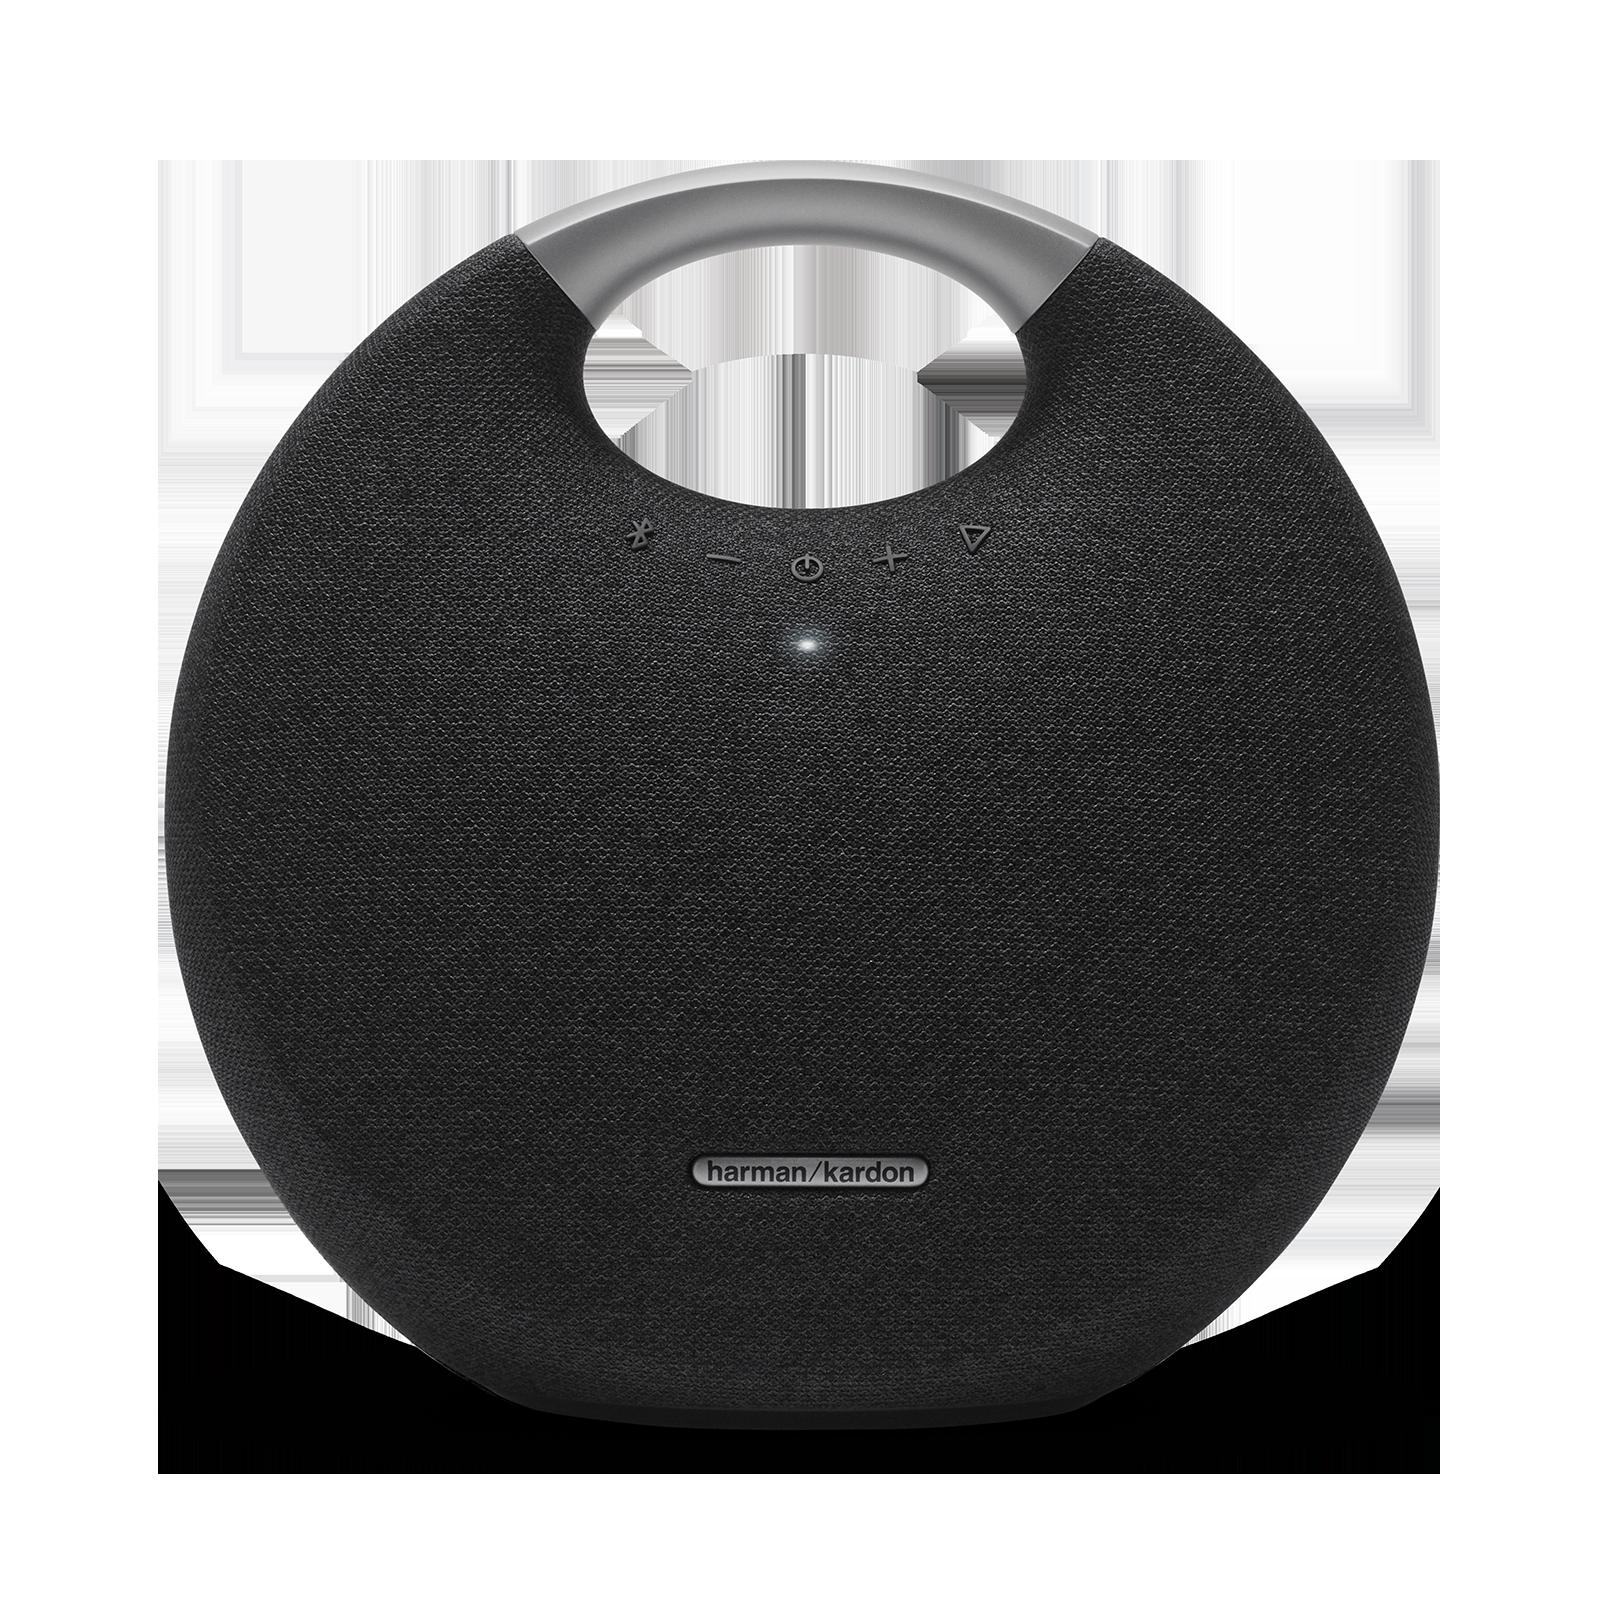 Onyx Studio 5 - Black - Portable Bluetooth Speaker - Front